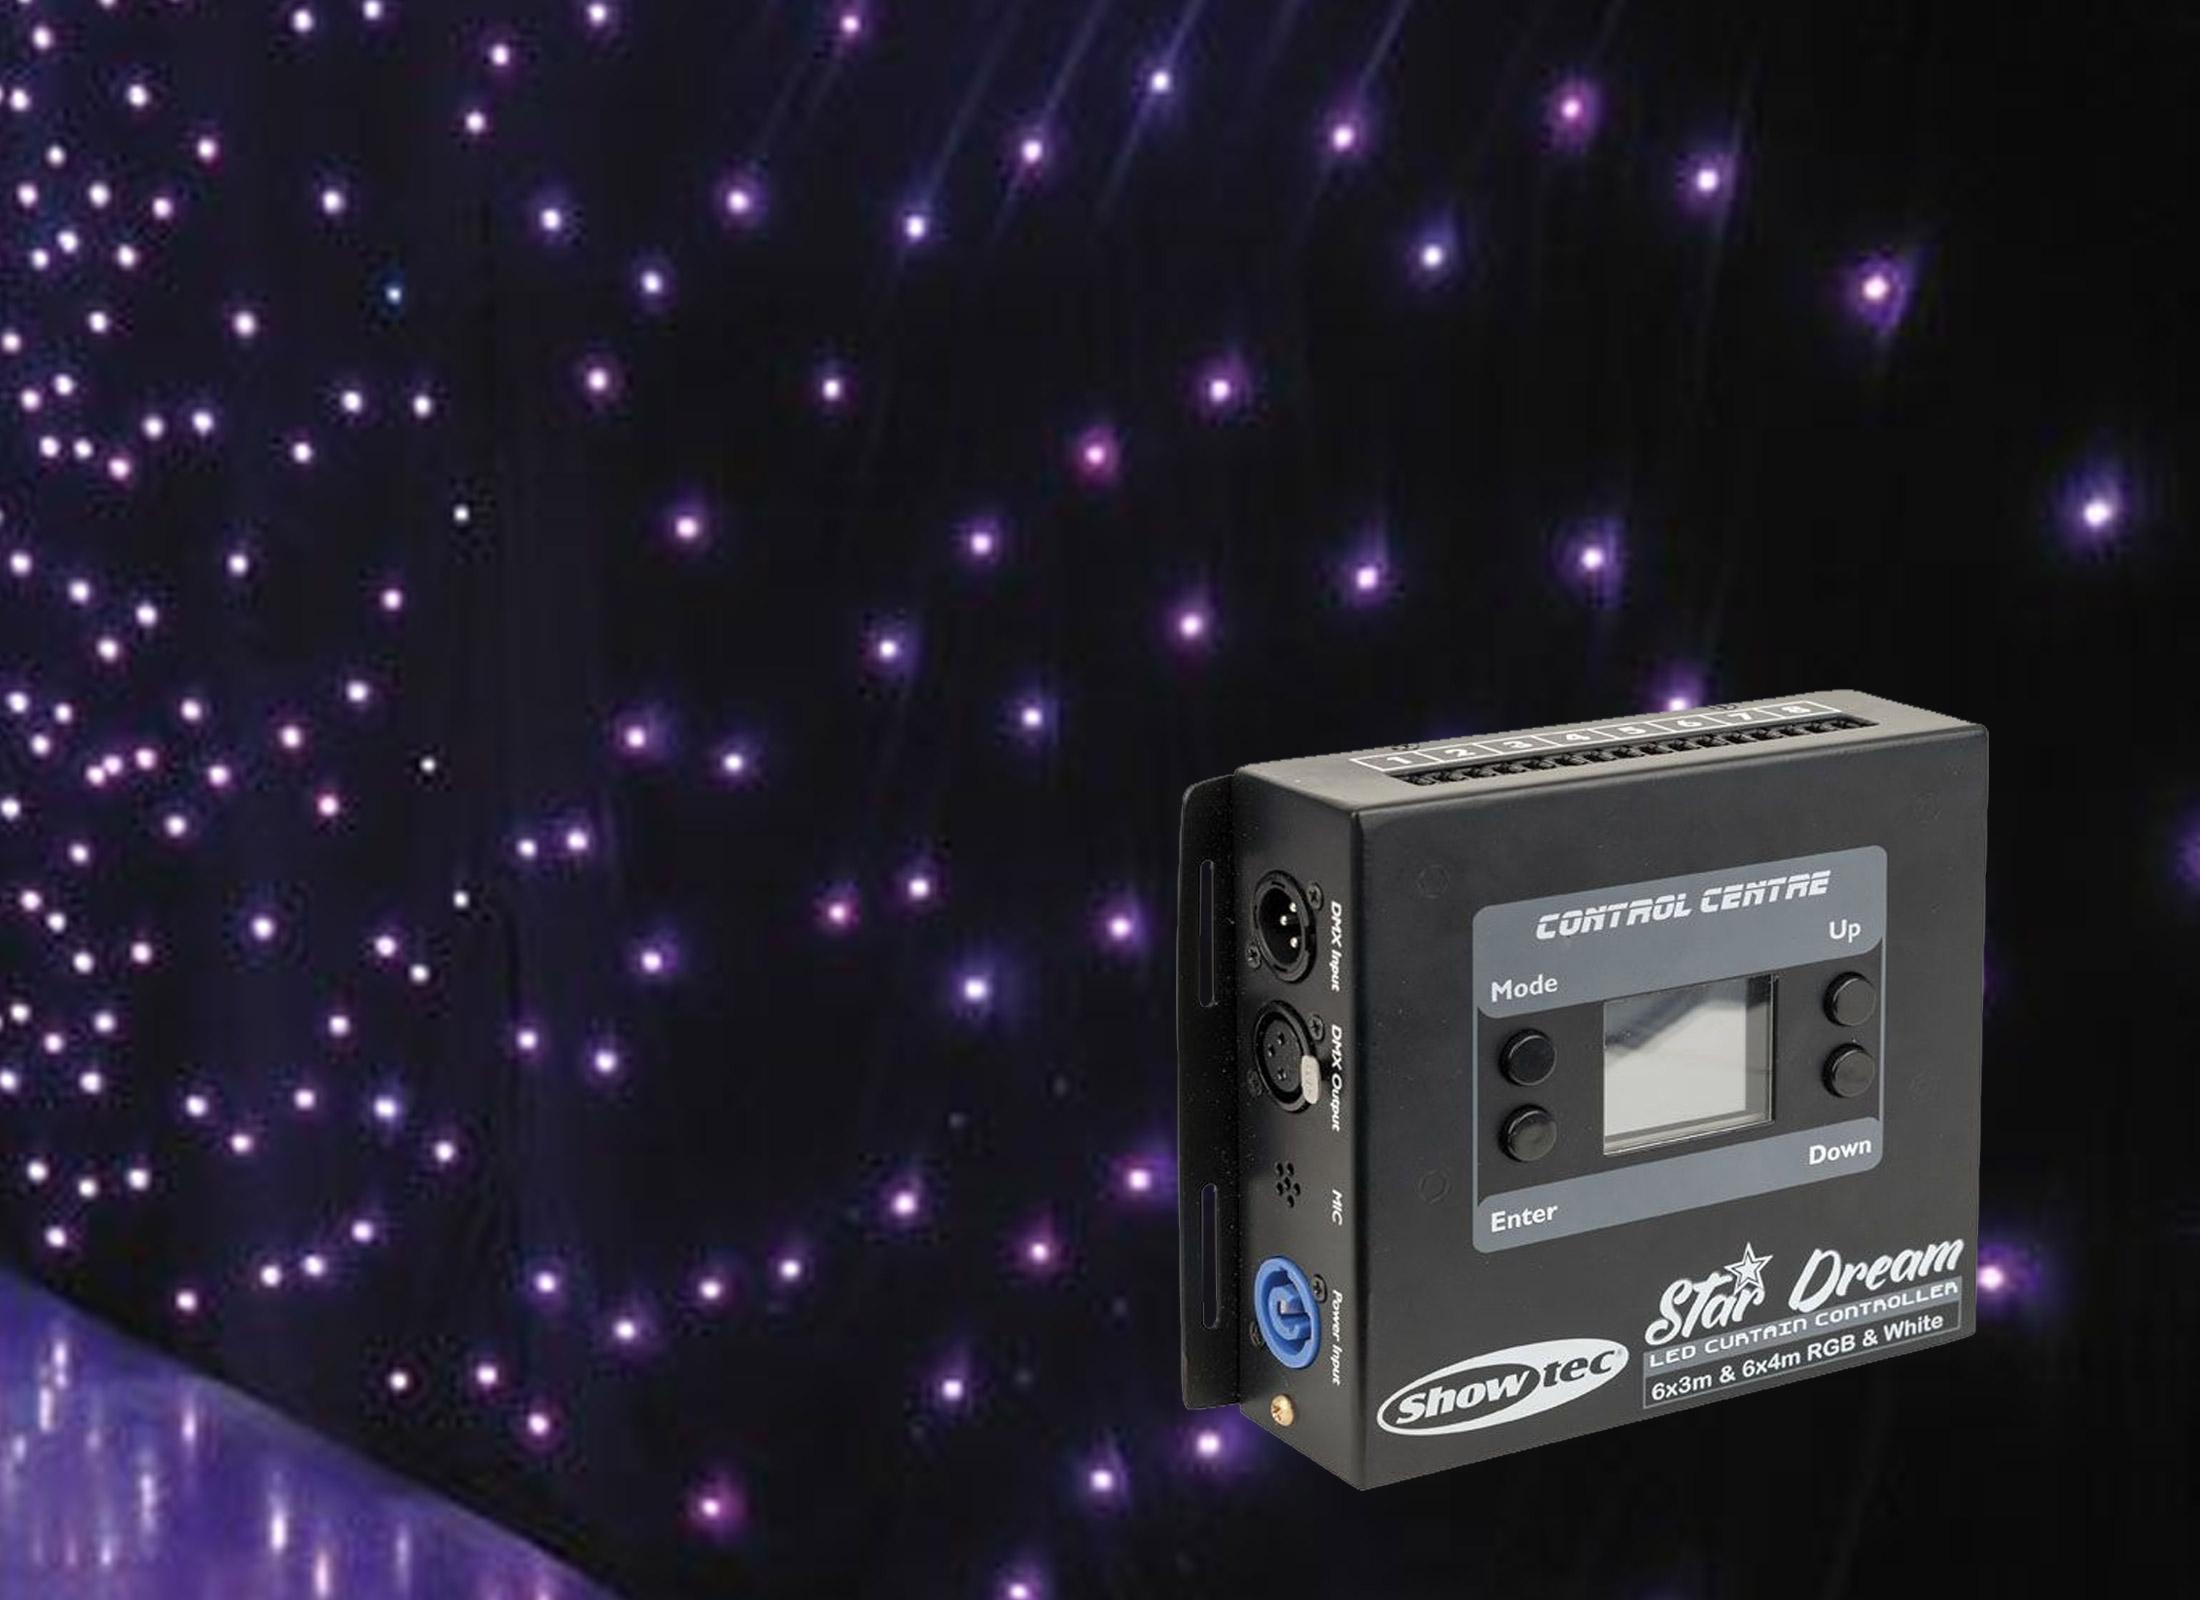 Showtec Star Dream LED Curtain, 6x3m, 128x5mm LED RGB, DMX, Sound to Light,  Master/Slave, incl  Controller